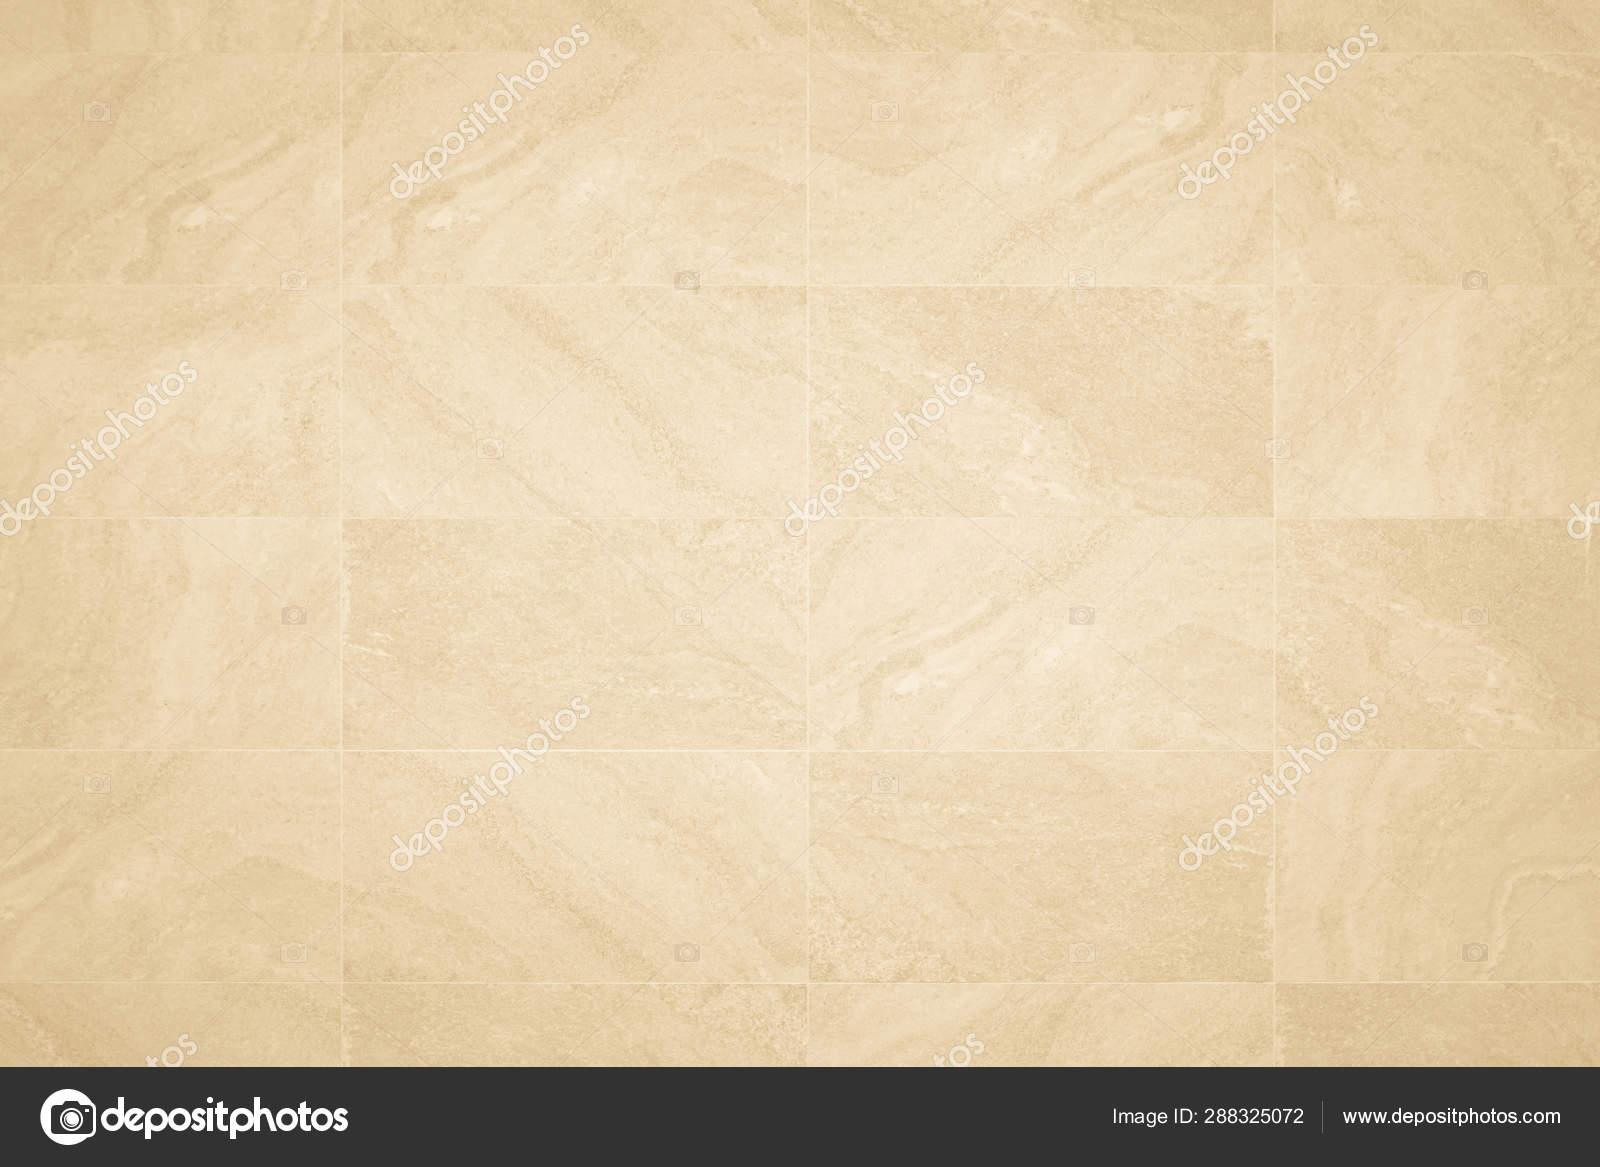 Cream Granite Texture And Background Or Slate Tile Ceramic Seam Stock Photo C Phokin2516 Gmail Com 288325072